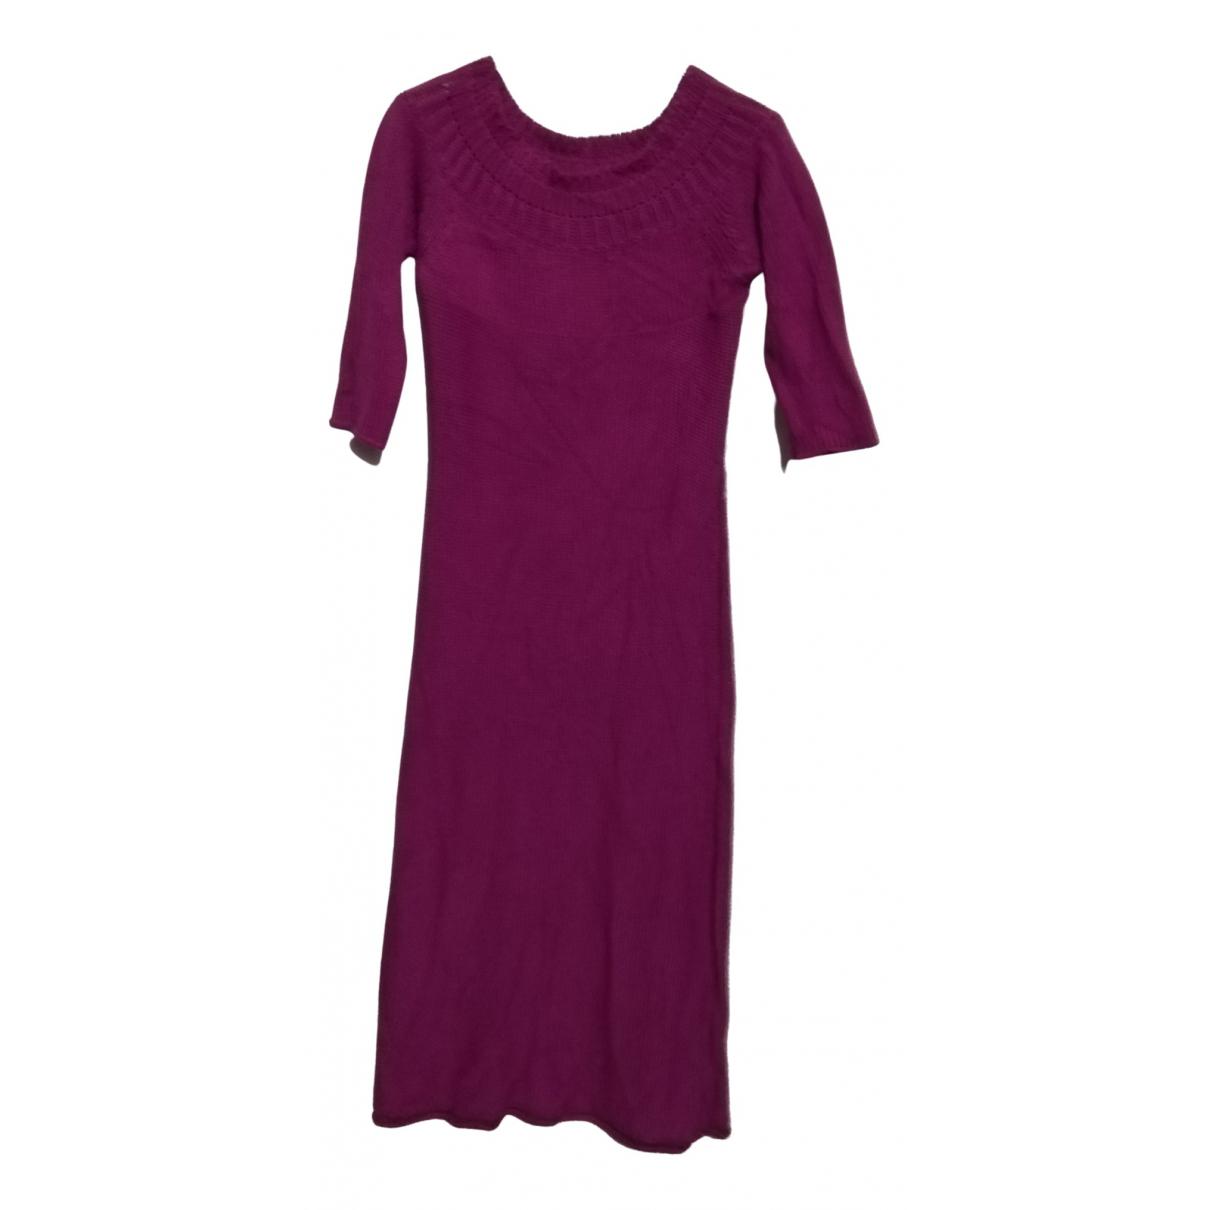 Patrizia Pepe \N Burgundy Cotton dress for Women One Size International